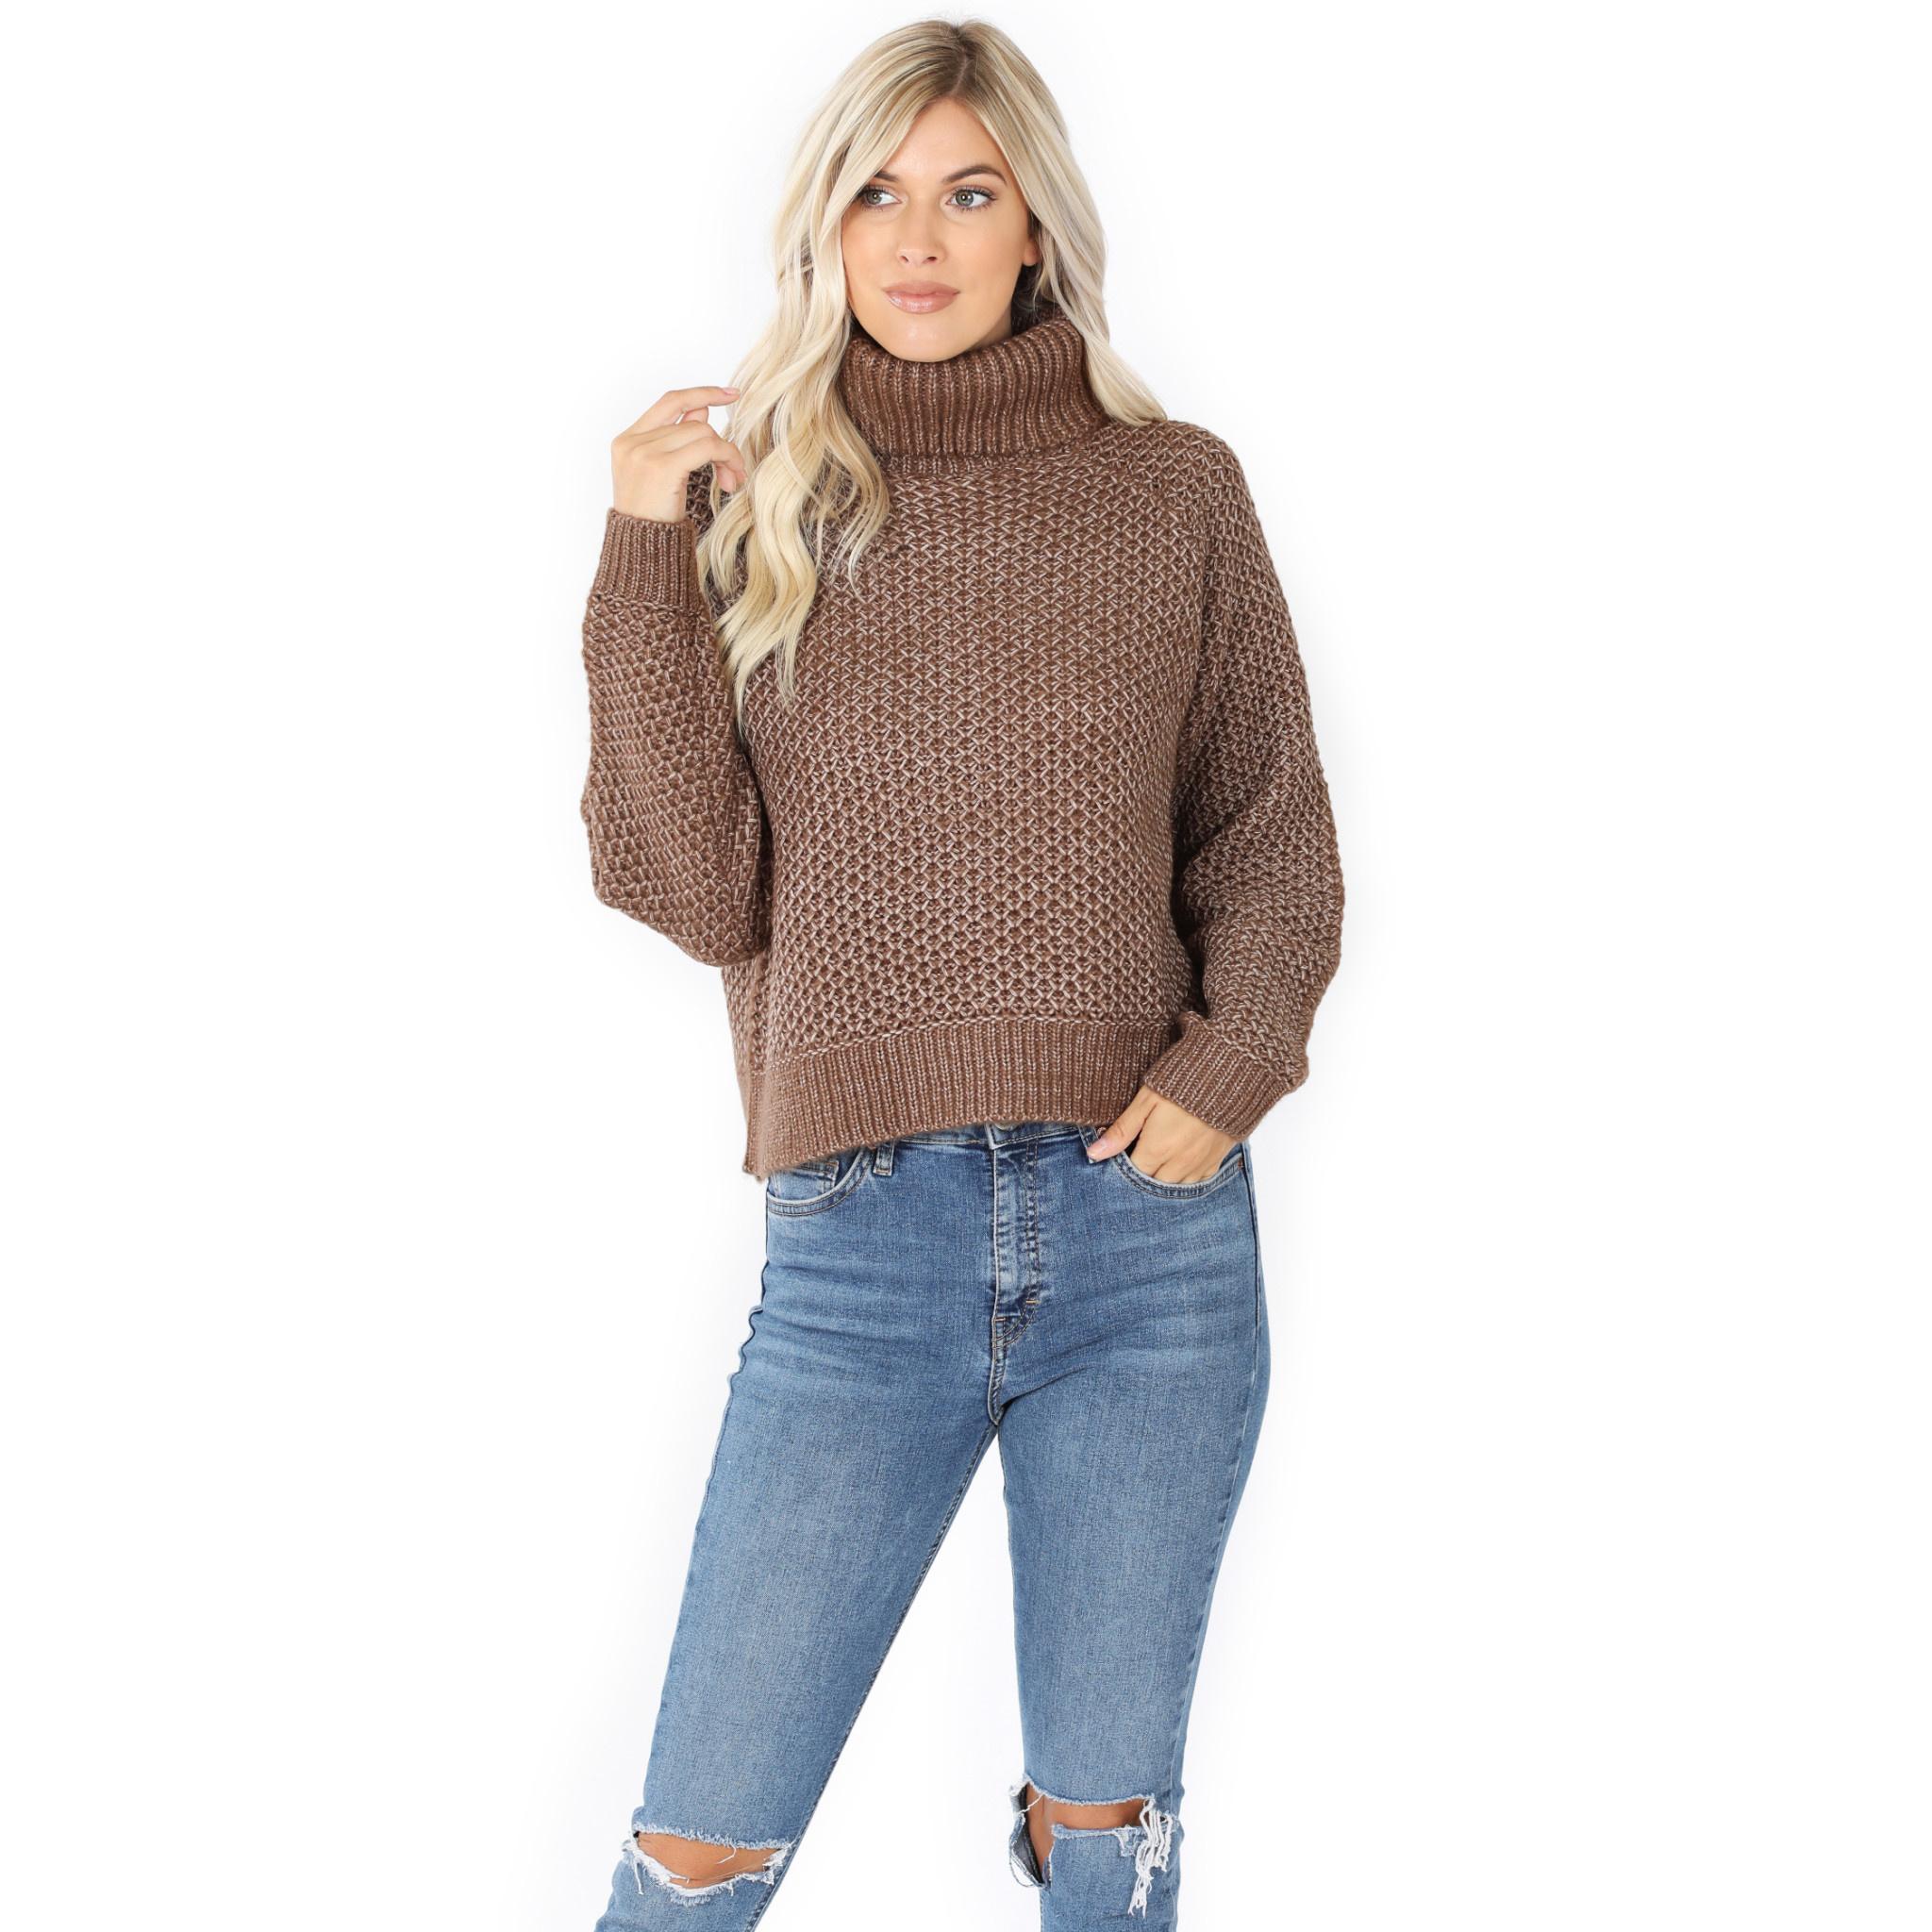 Fleurish Home Mocha Melange Turtleneck Sweater